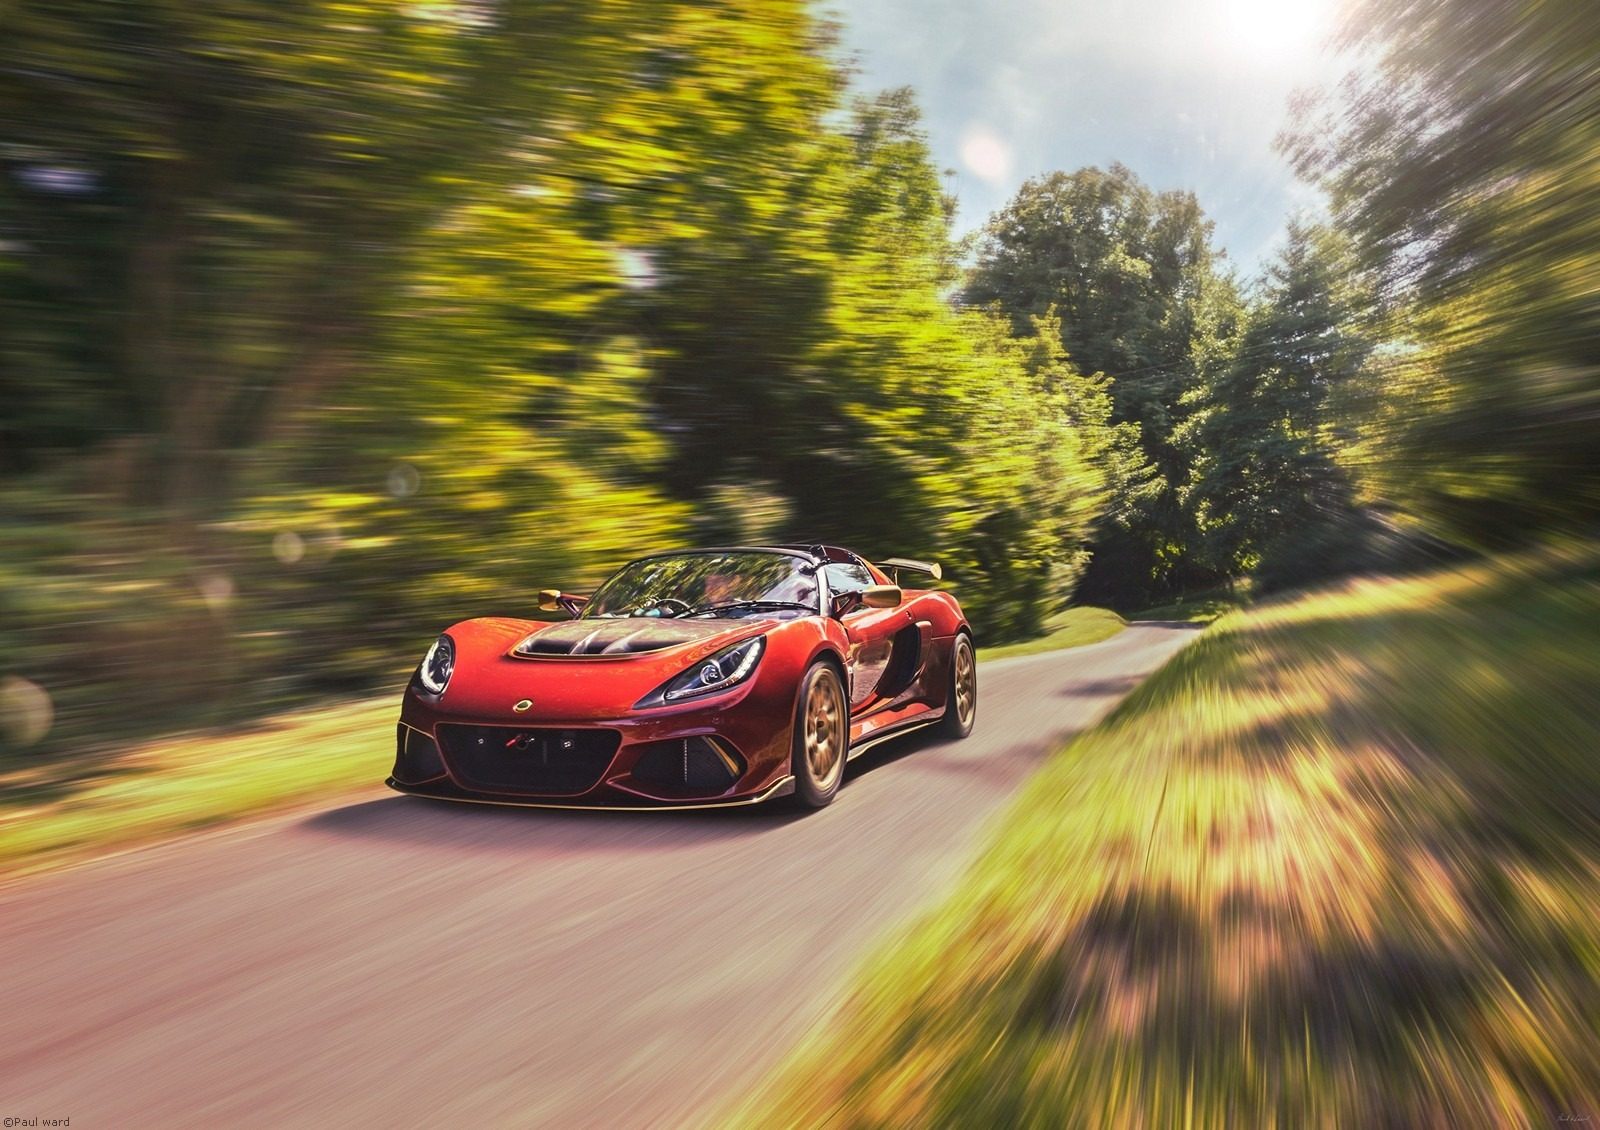 Lotus Exige car by Birmingham car photographer Paul Ward